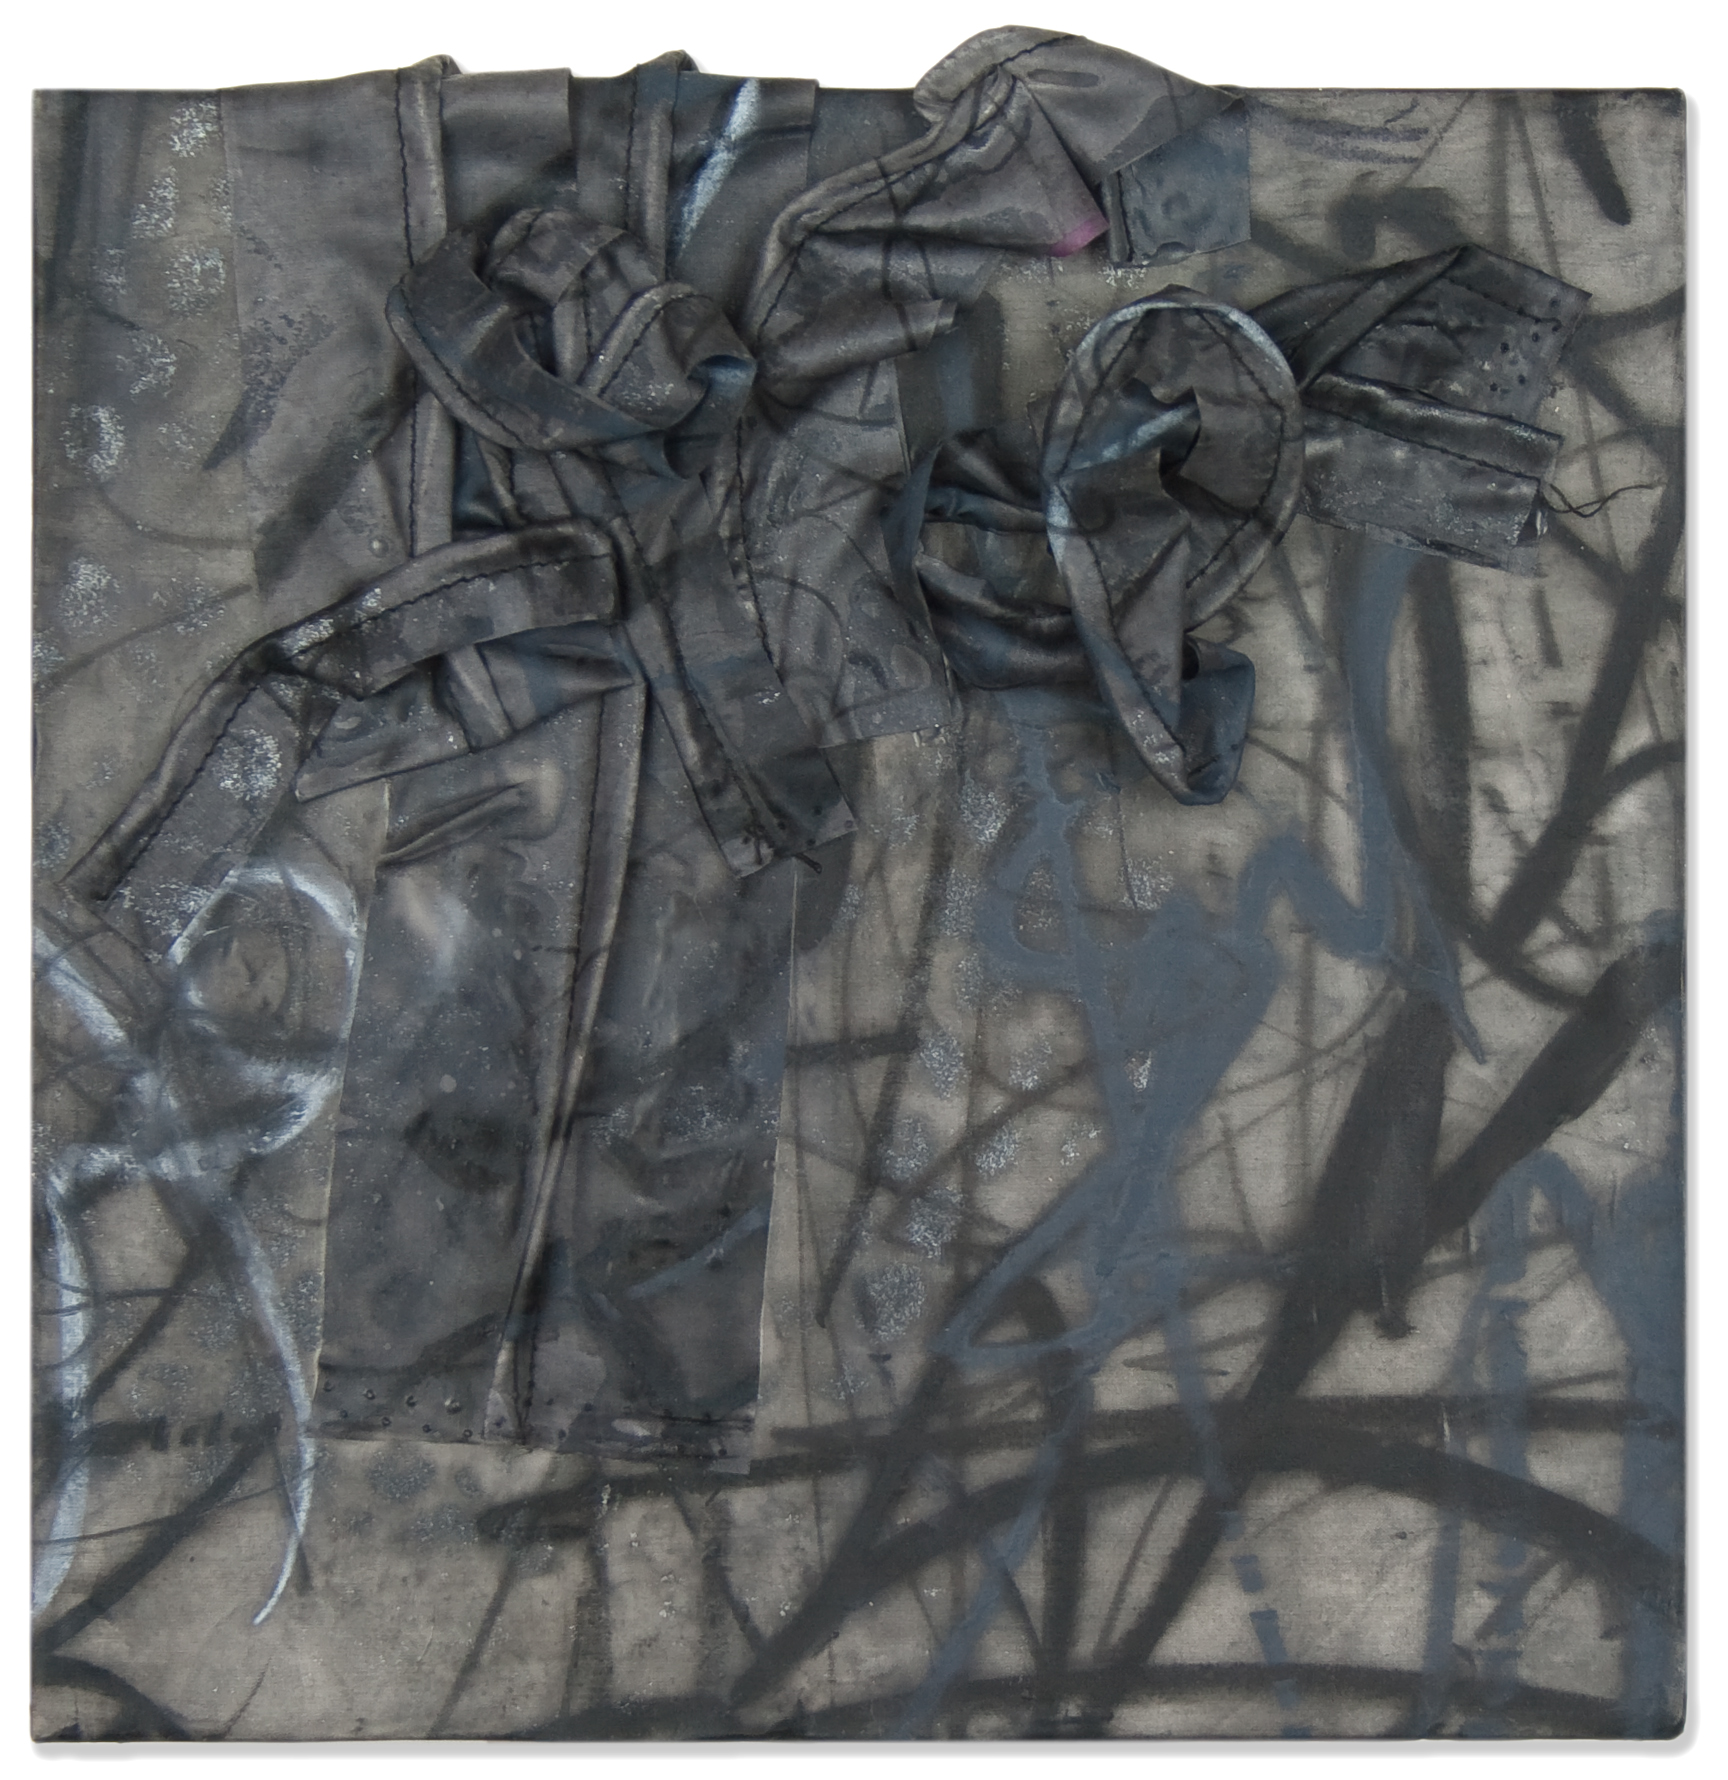 Winiarski_Untitled_No.4_Black_and_Grey.jpg